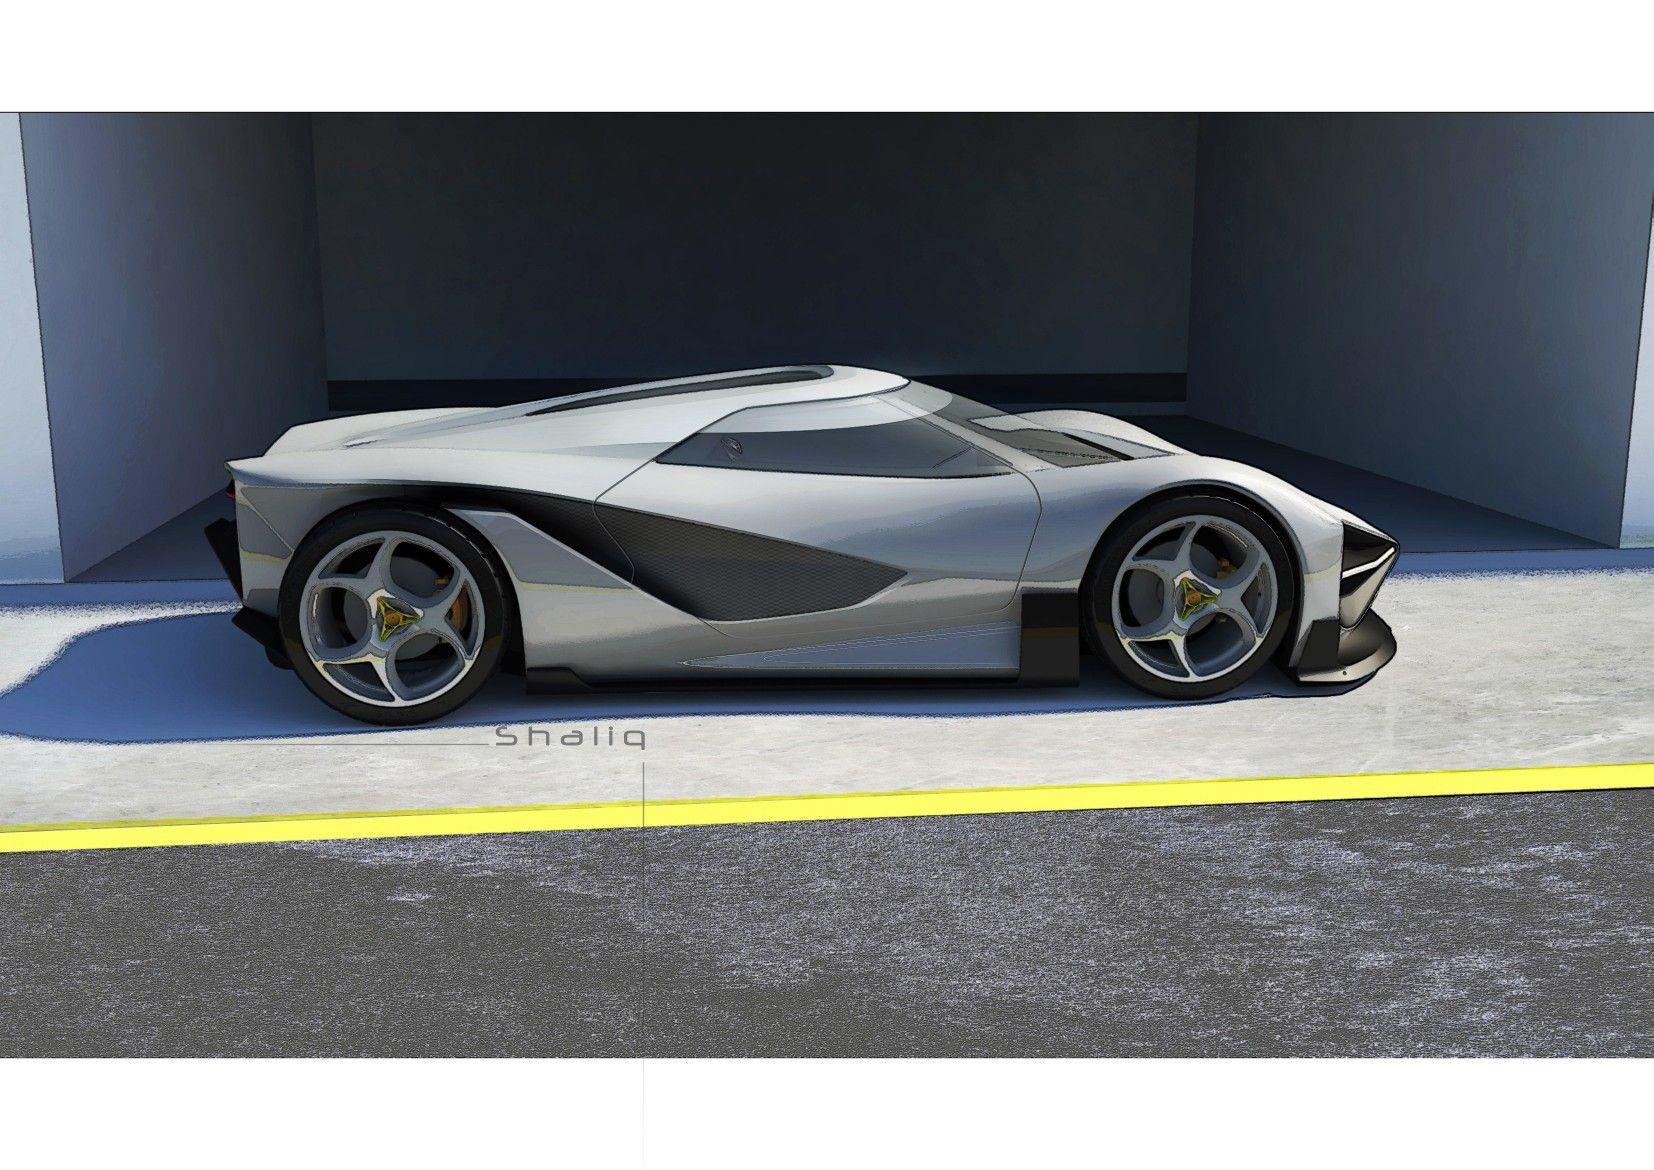 #supercars #hypercars #cardesign #cardesignsketch #koenigseggsketchchallenge #koenigsegg #cardesign